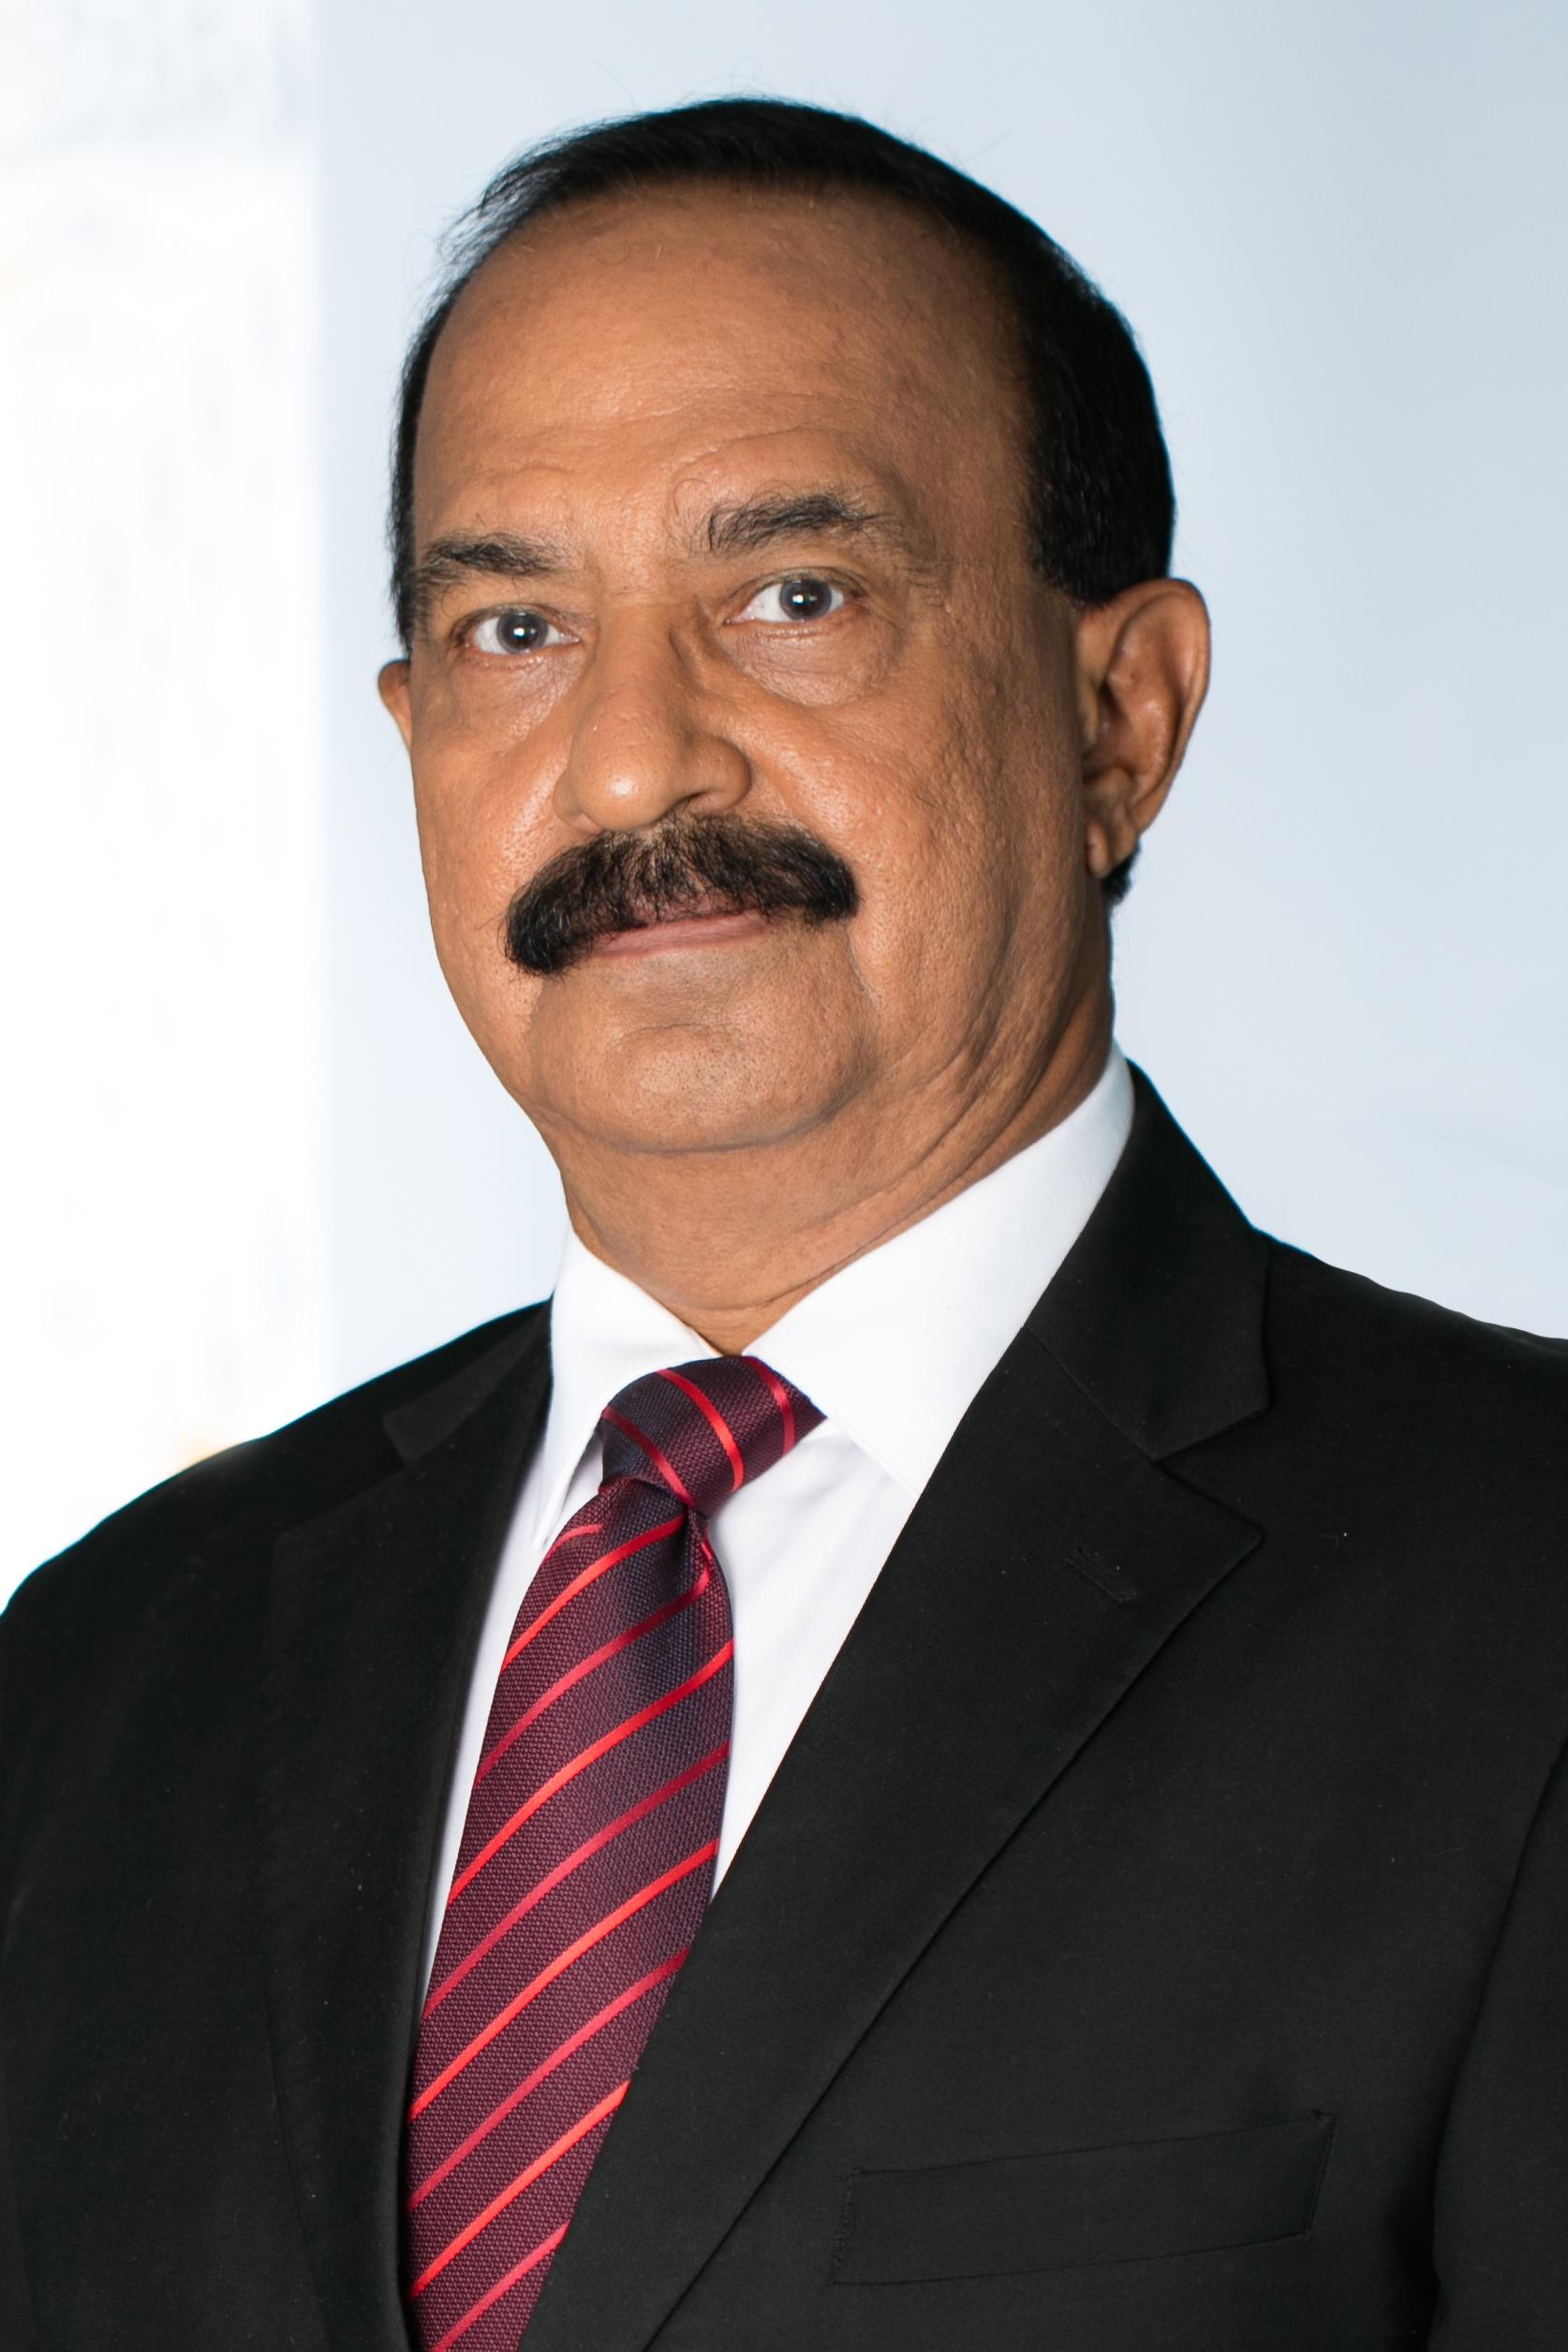 Raúl Taboada